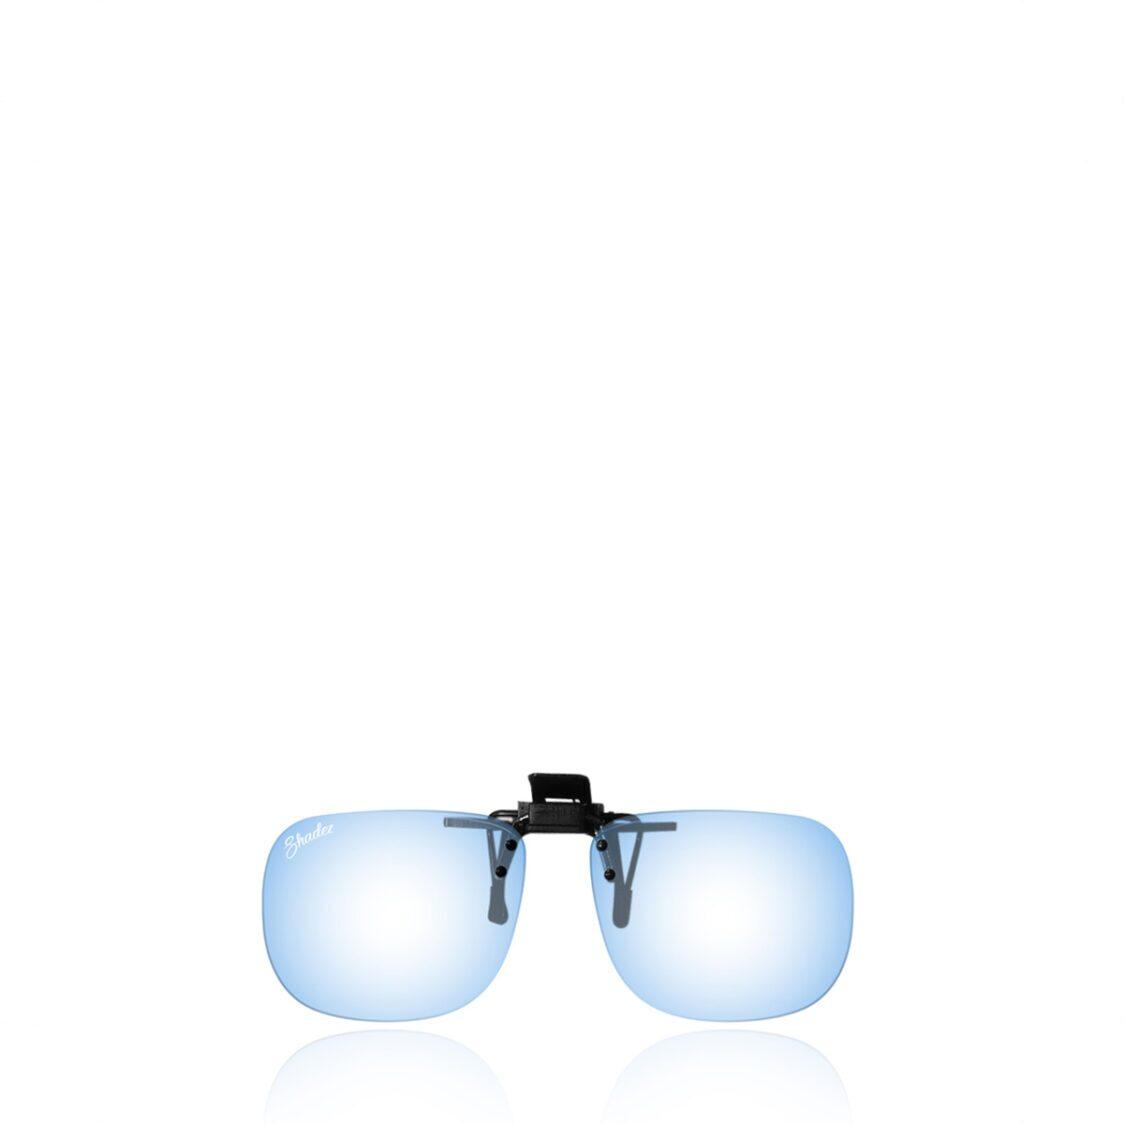 Shadez Eyewear Blue Light Clip On Junior Aged 3-7 Years Old SHZ-309